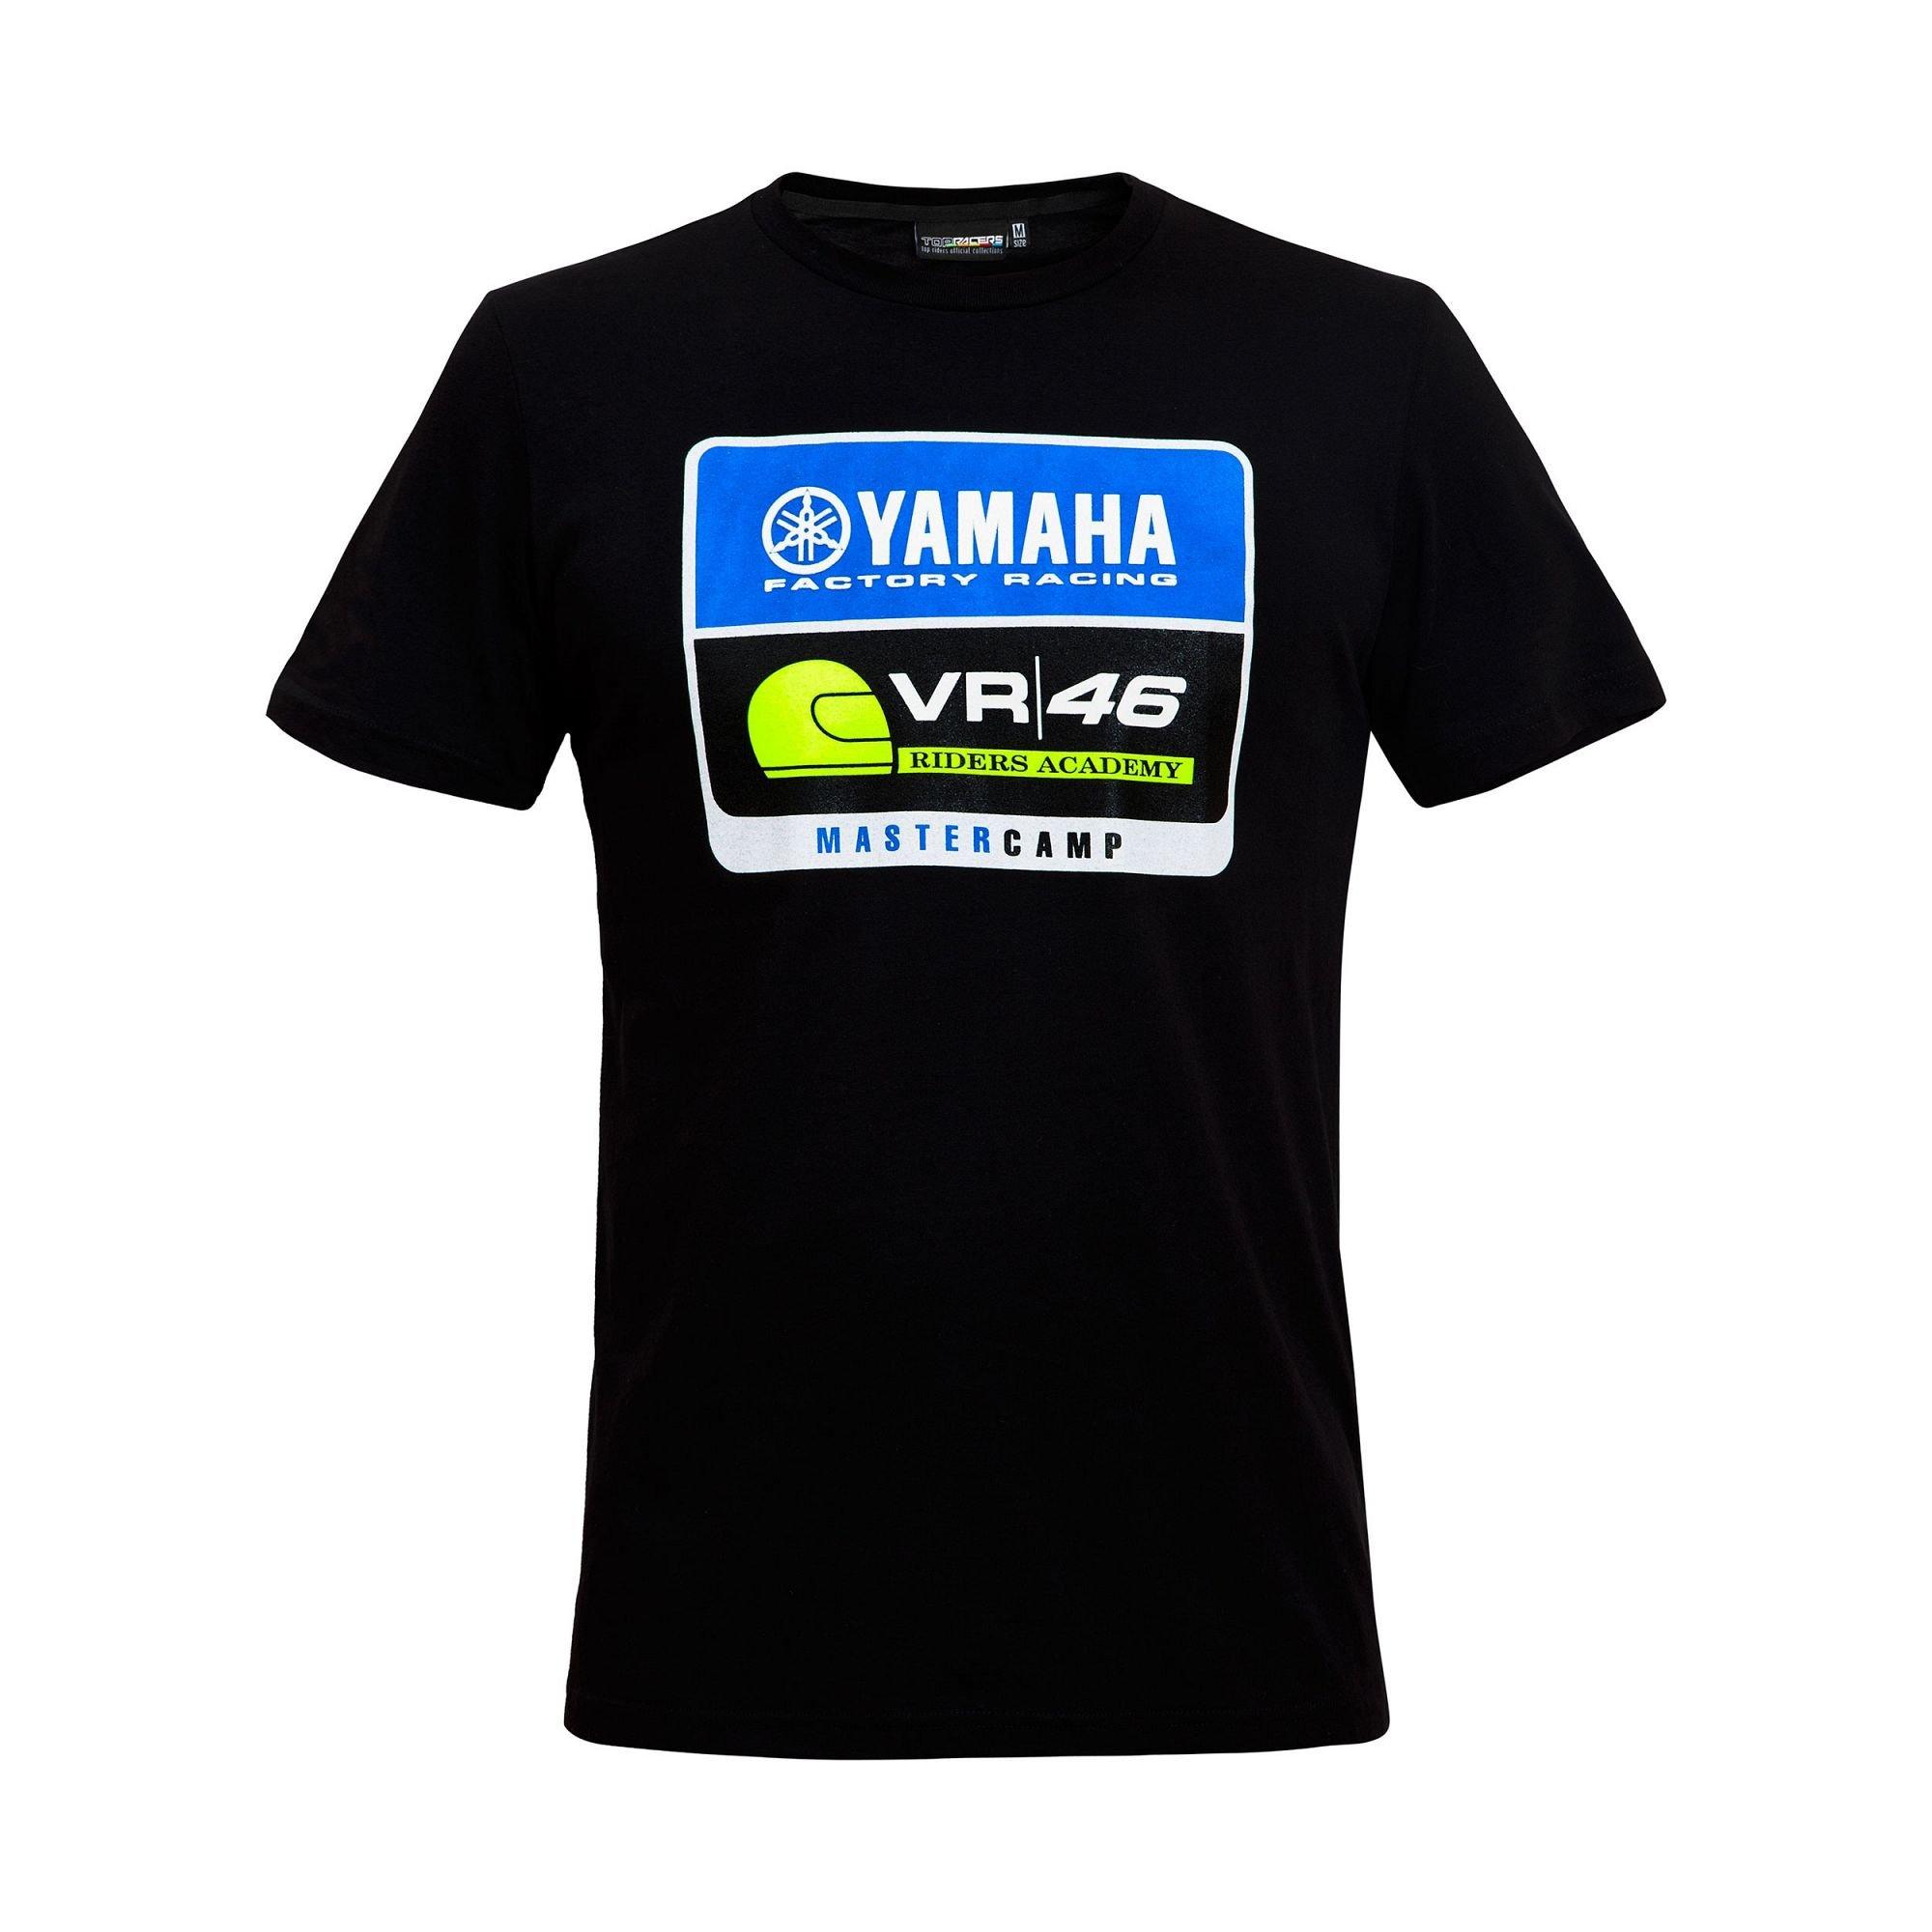 Vr46 Pánské triko Yamaha Mastercamp 2017 XL